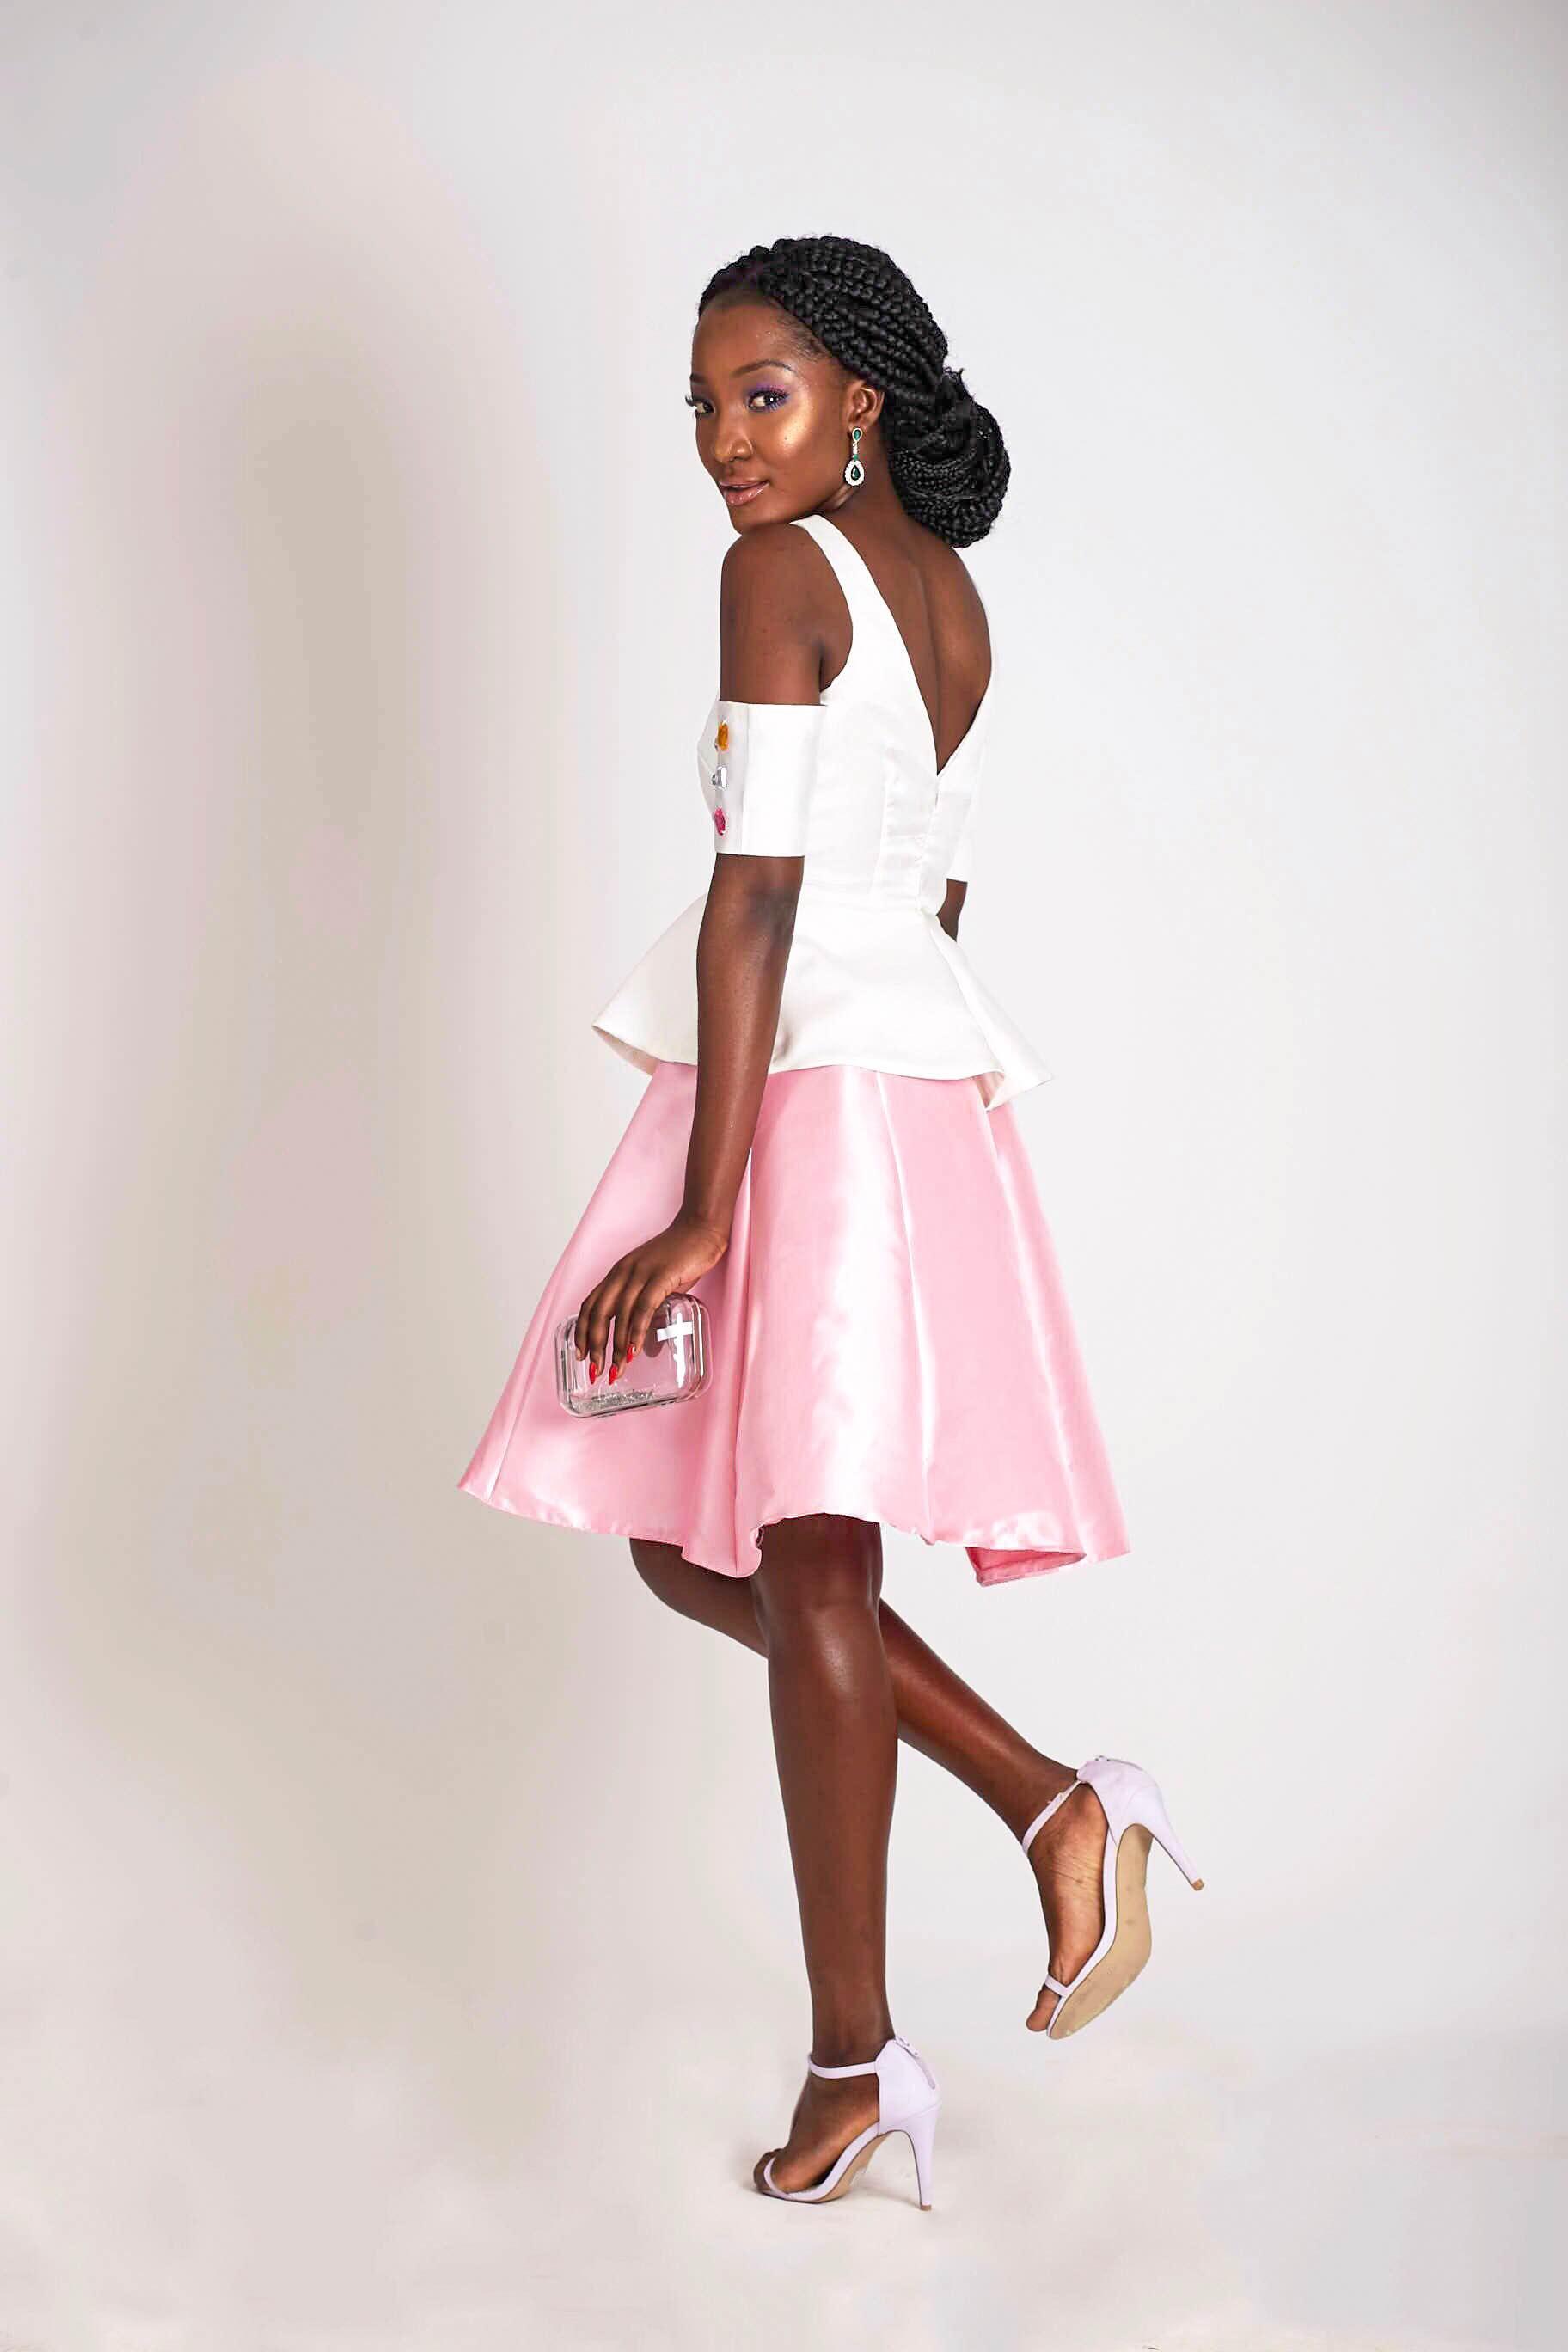 Imad Eduso - BN Style - Collection Lookbook - BellaNaija.com 07